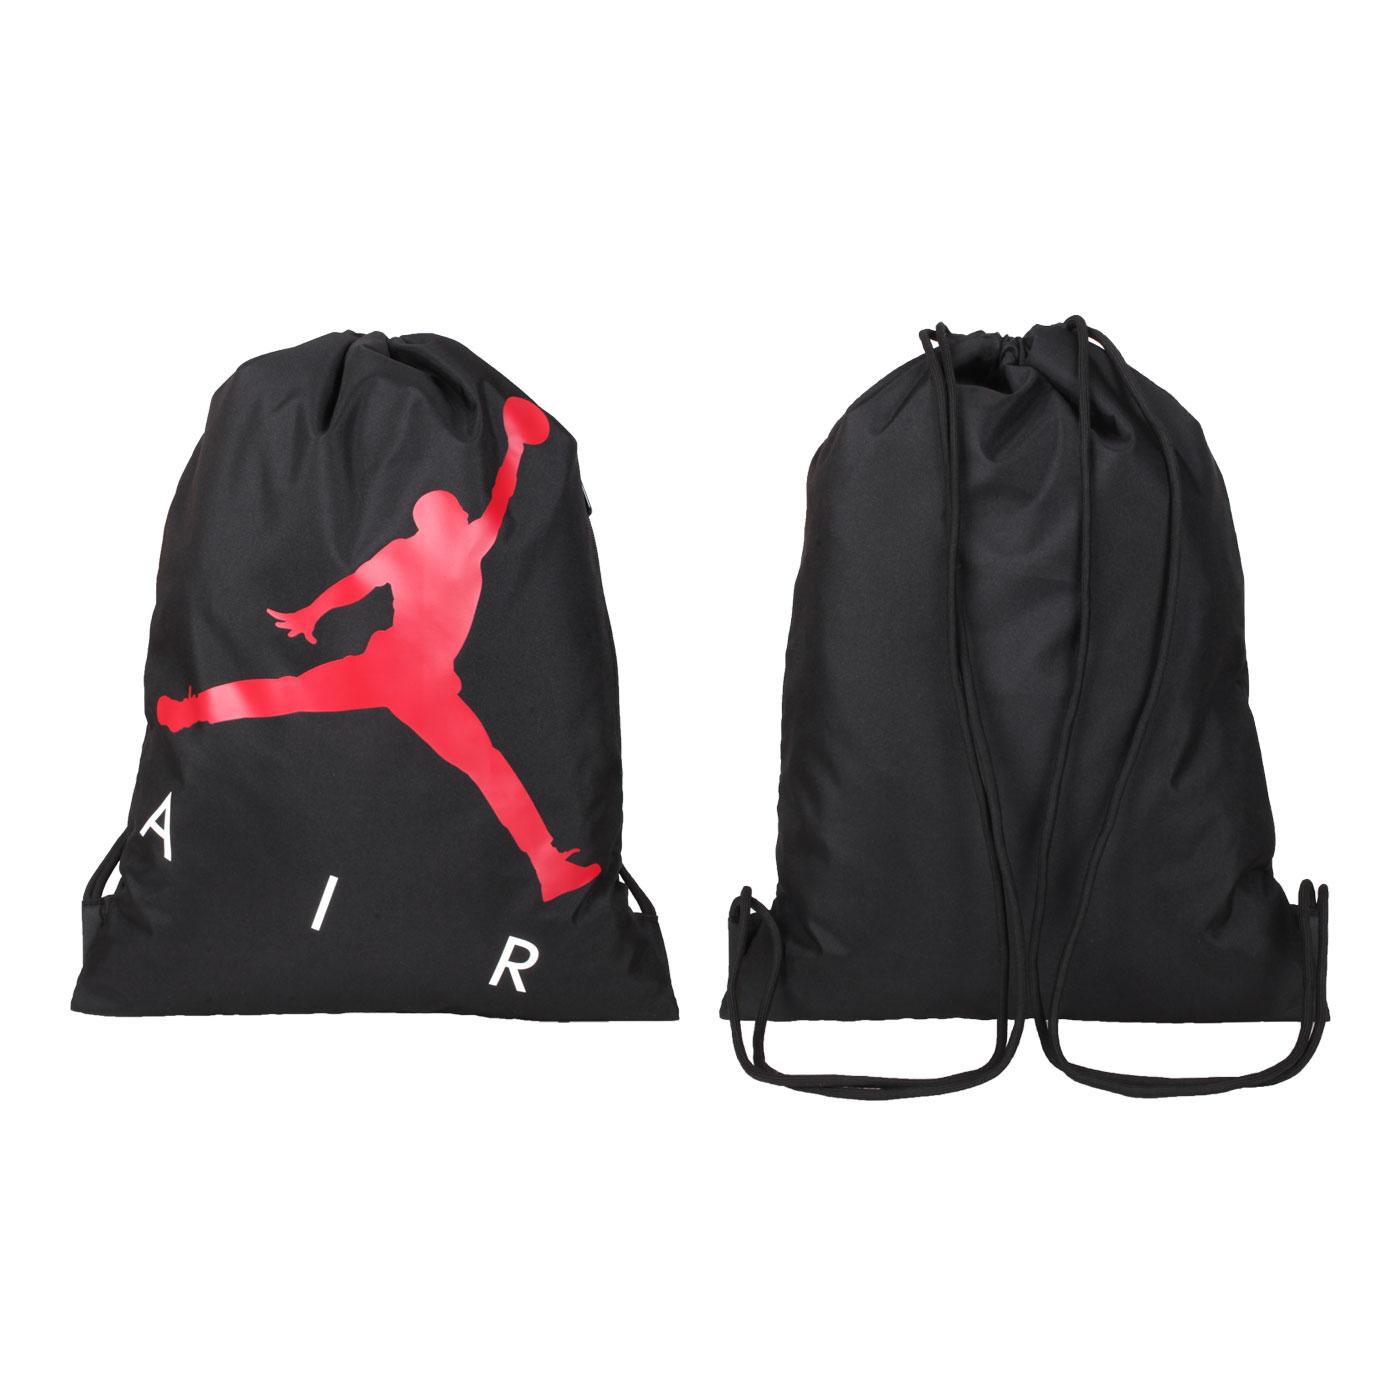 NIKE JORDAN 束口袋 JD2113040AD-001 - 黑紅白